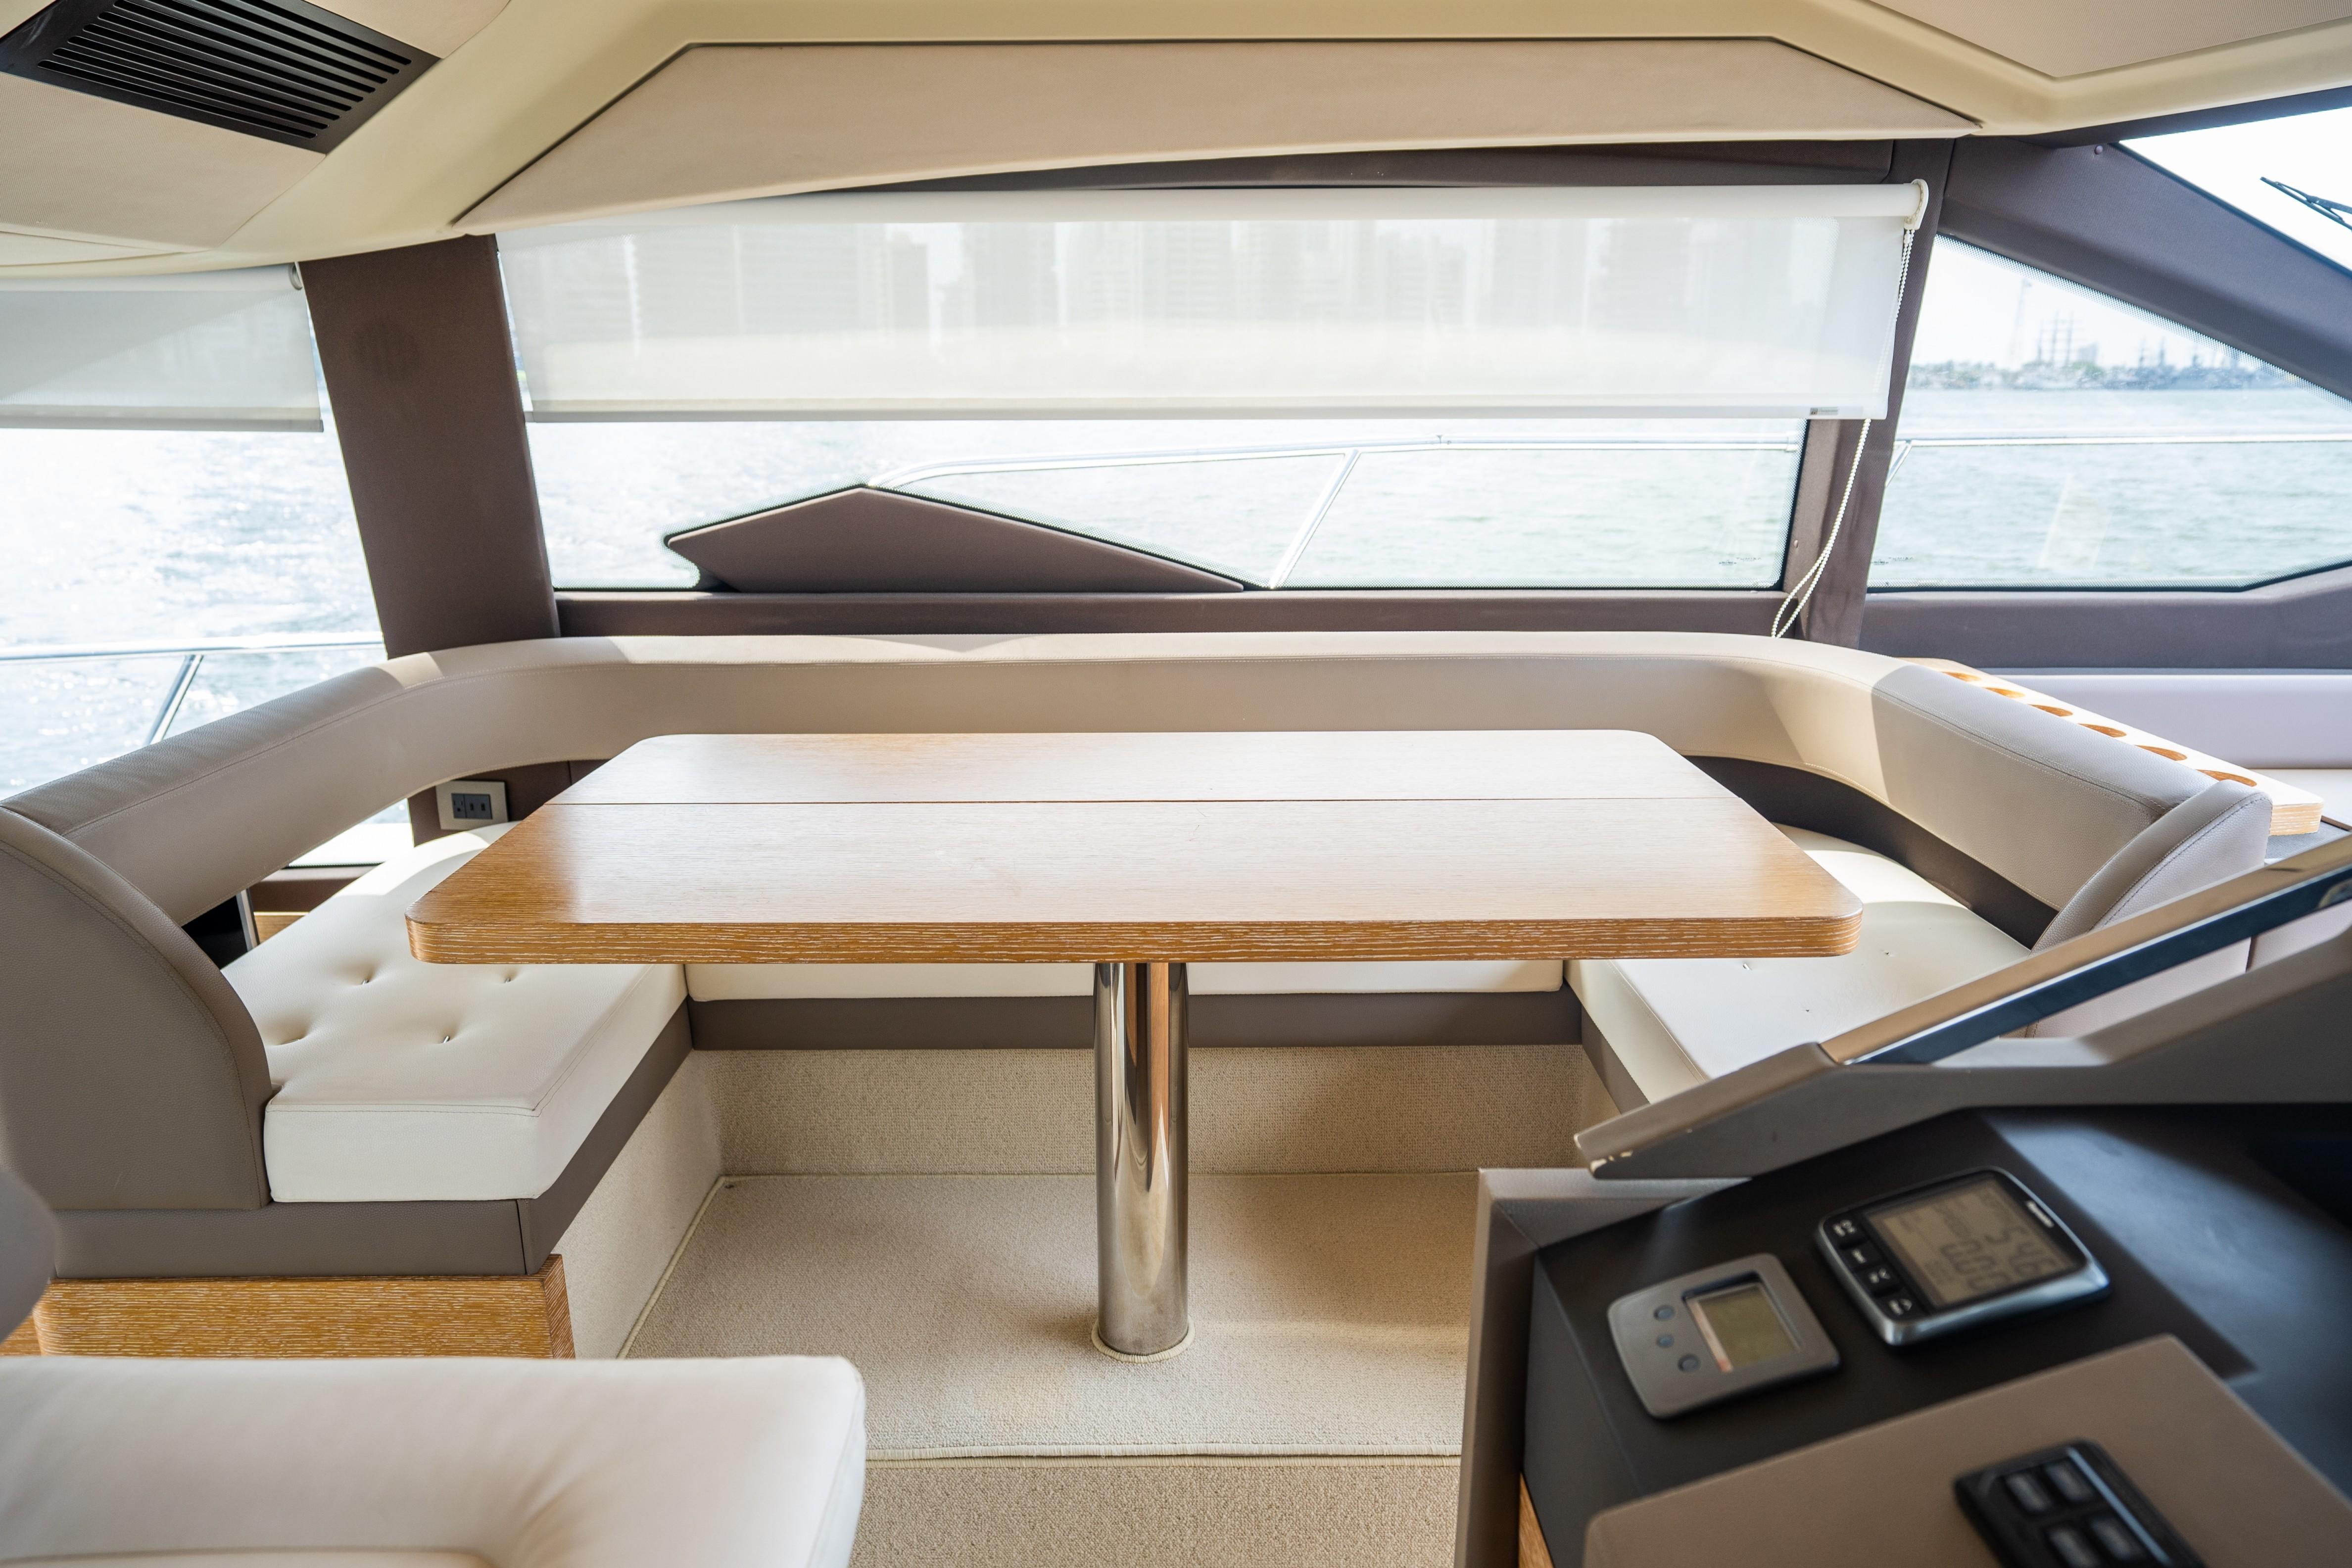 2015 Azimut 50 ''Isamar'' - Helm seating area